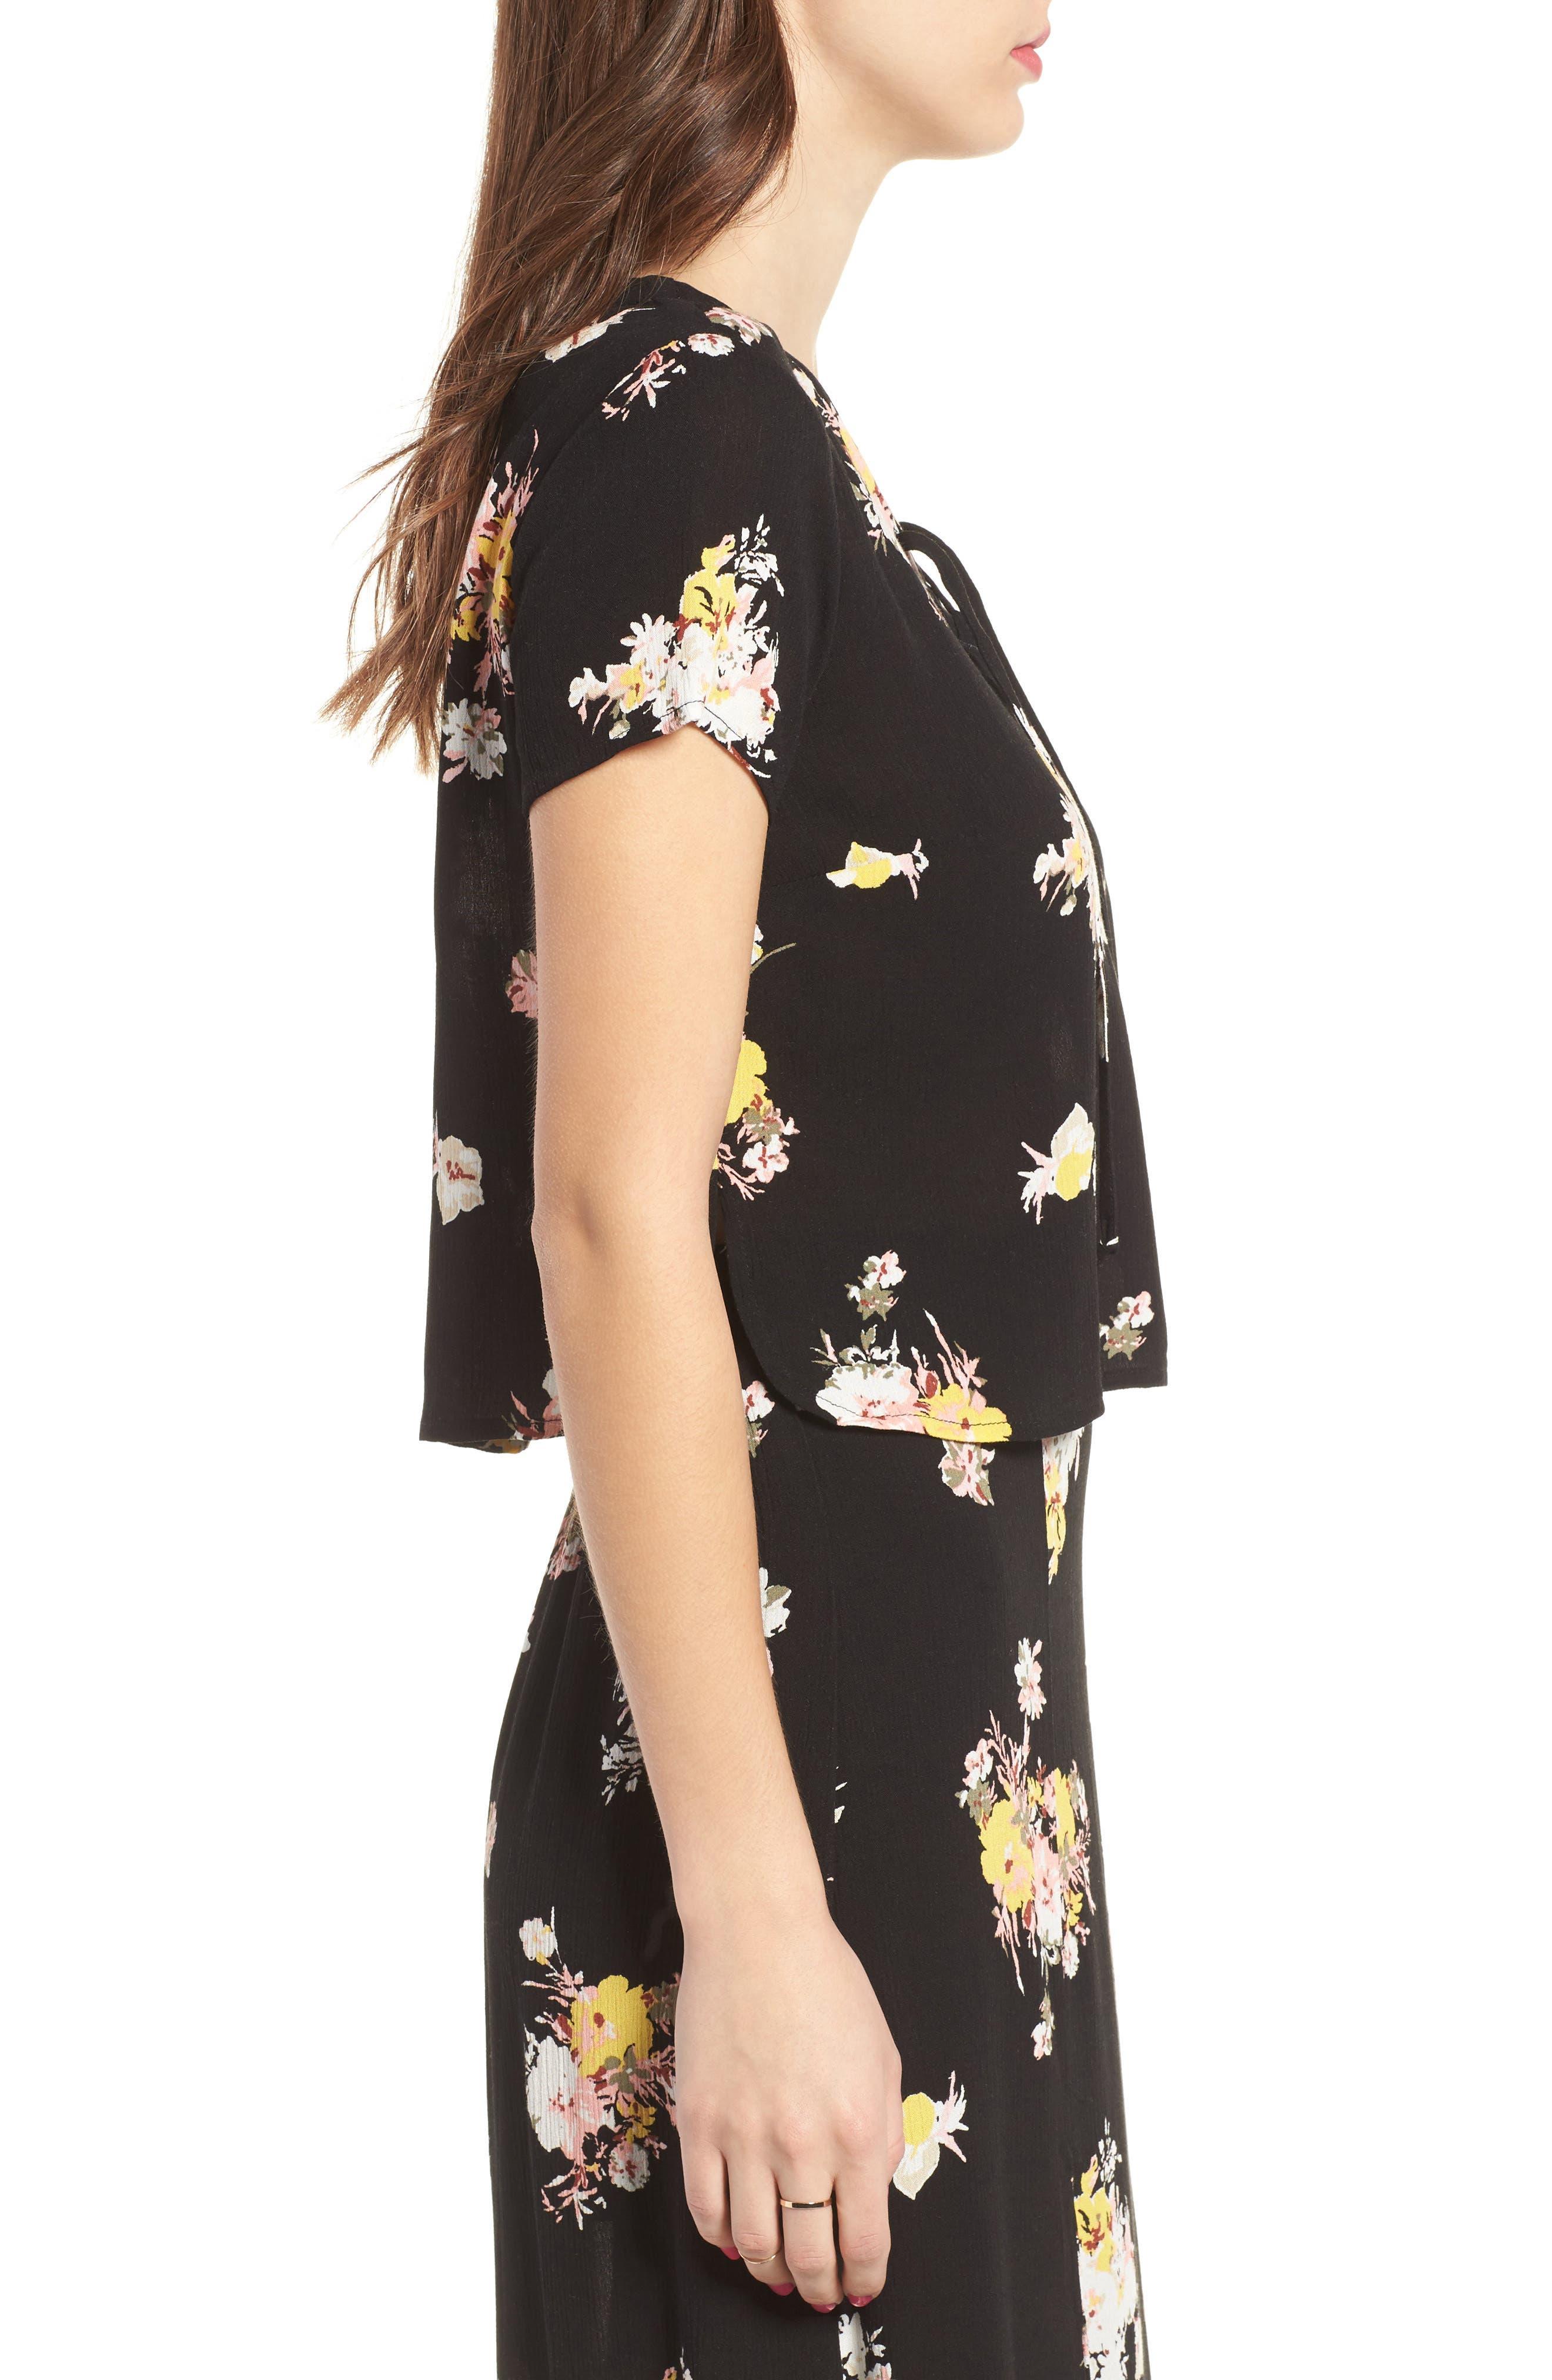 Coordinating Lace-Up Crop Top,                             Alternate thumbnail 4, color,                             Black Blush Floral